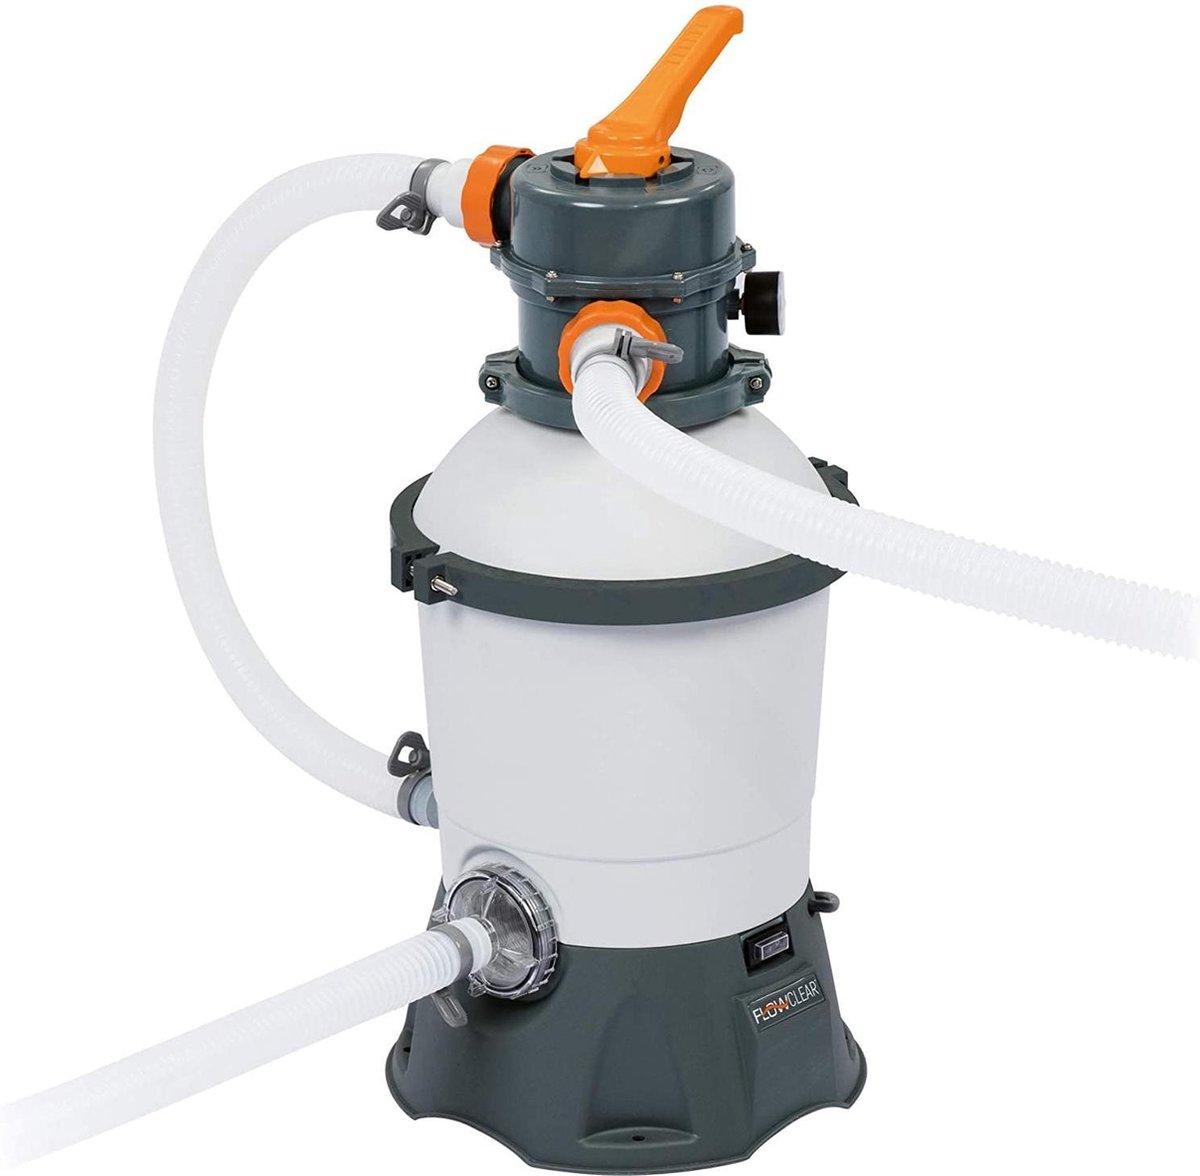 zwembad filter -sellnet bestway flowclear 58515 zandfilterpomp zwembad schoonmaak 3.028 l / h - (WK 02123)